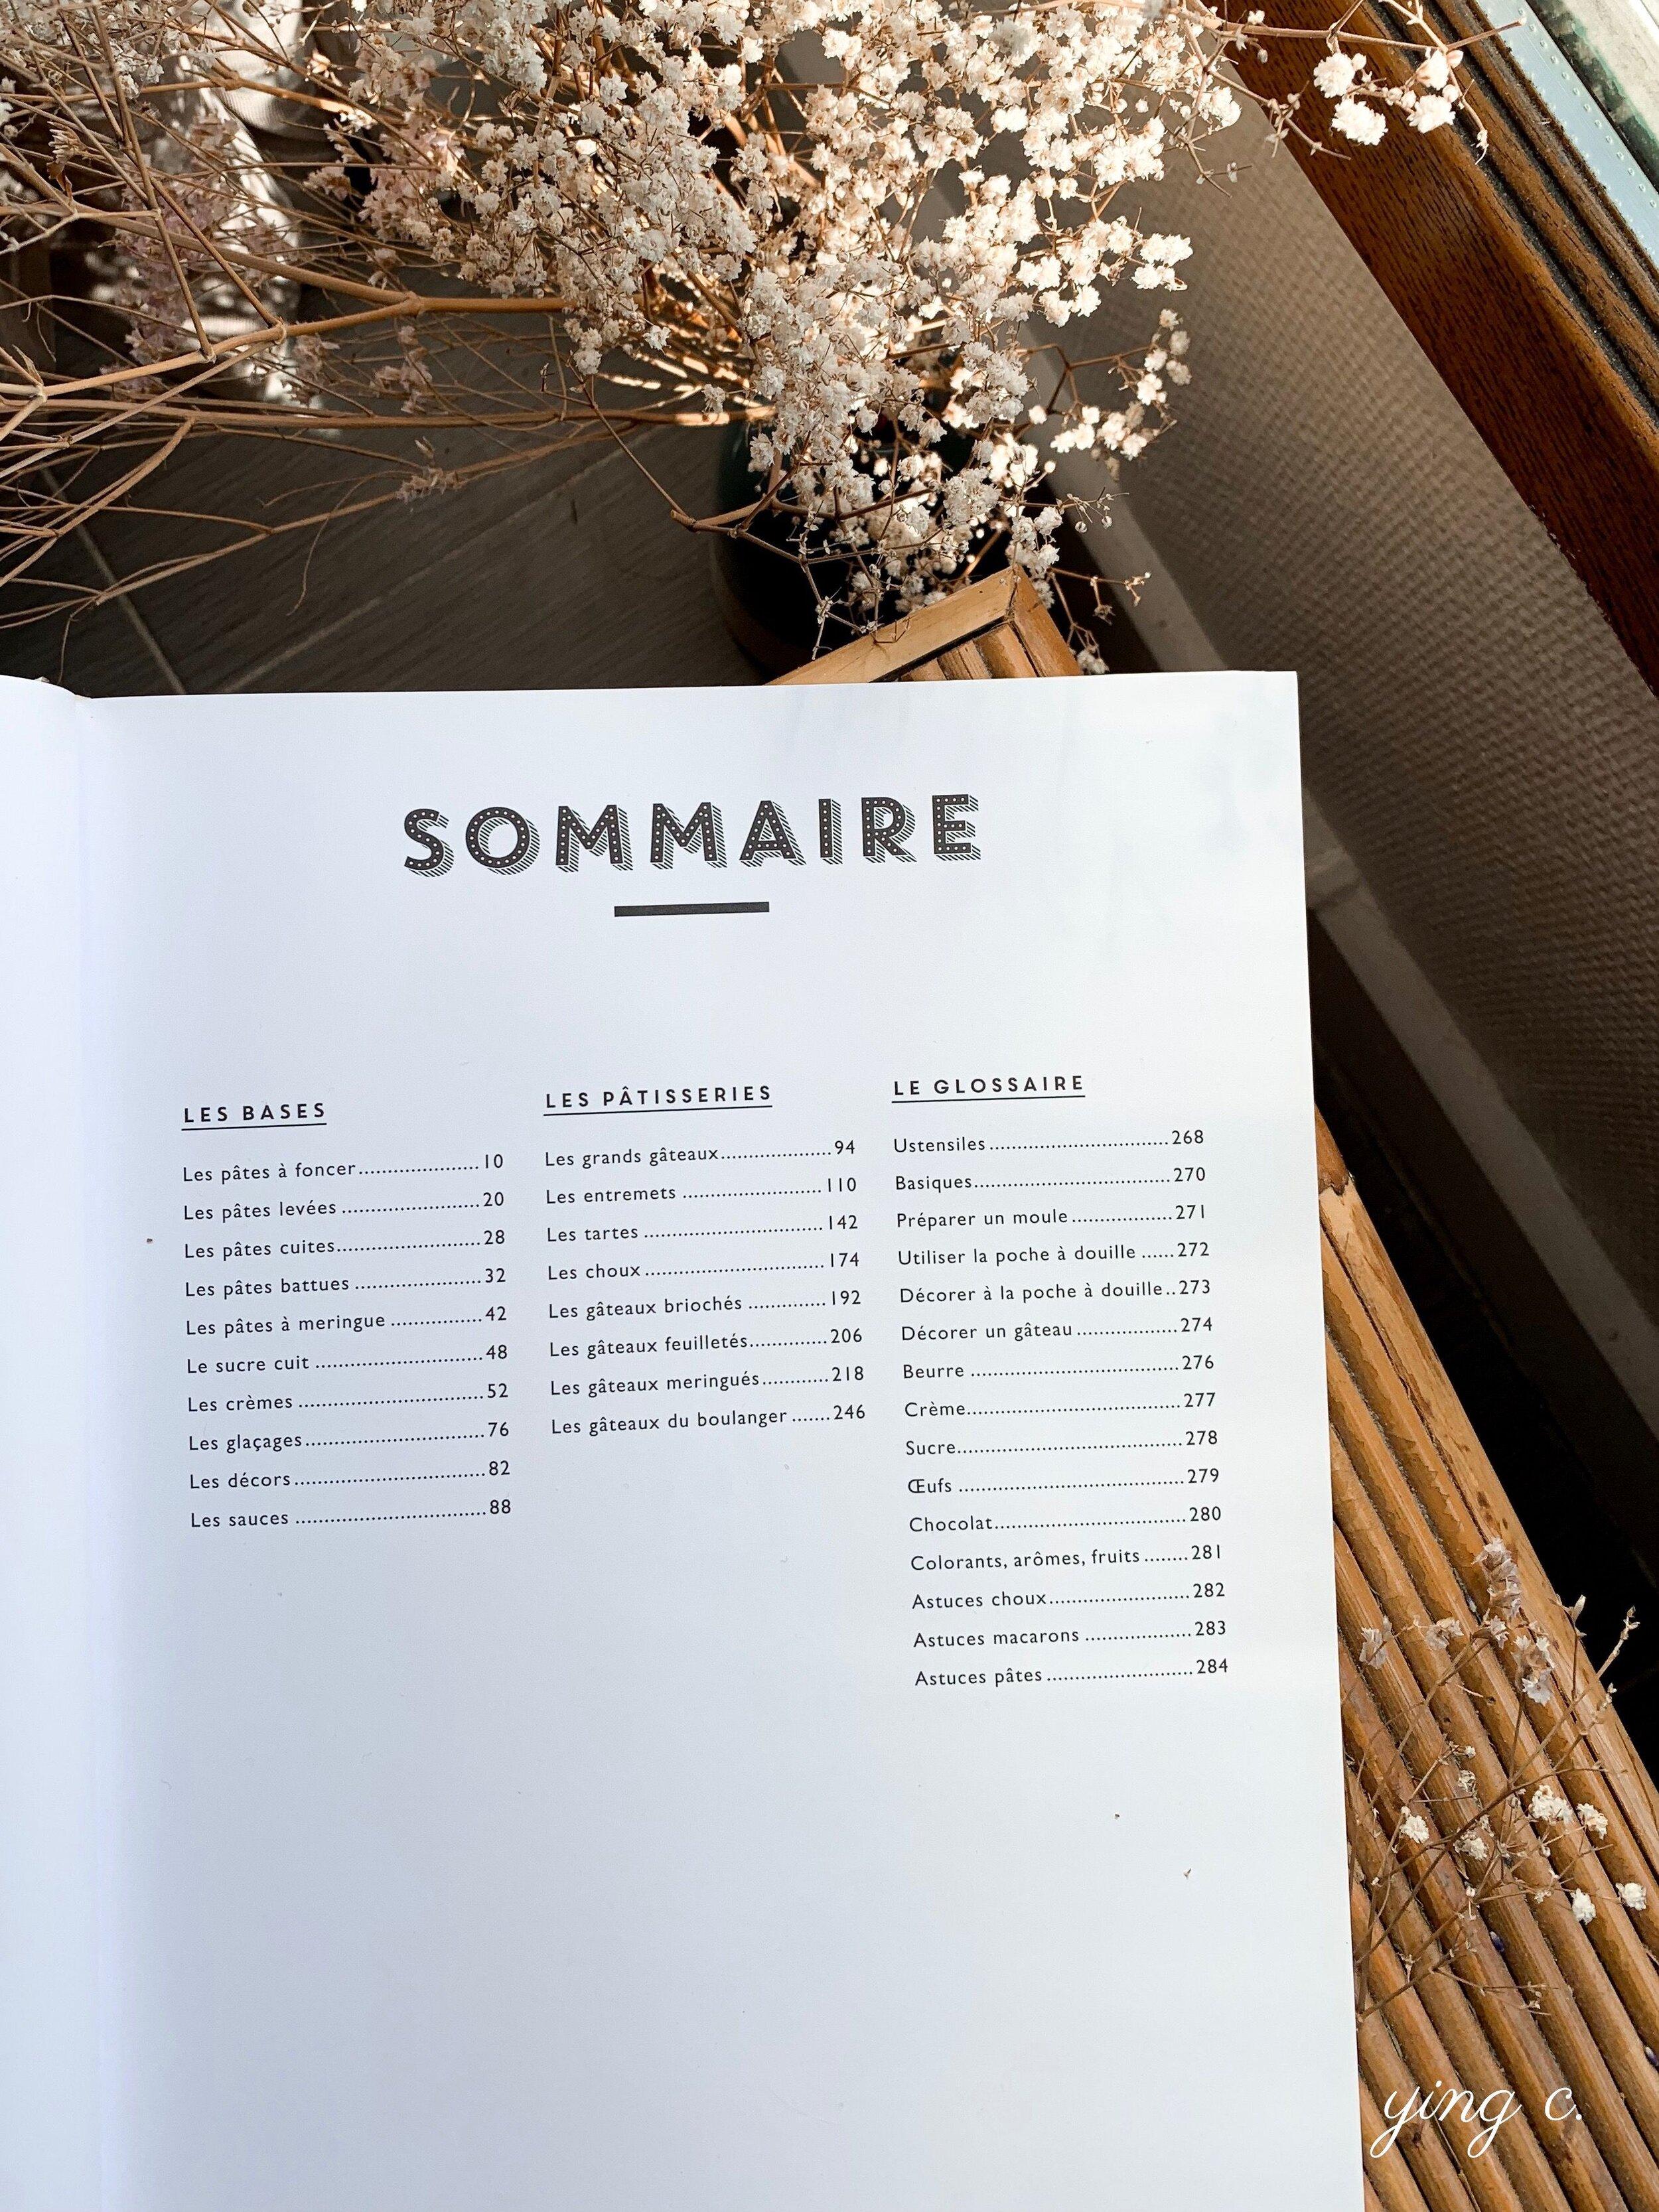 《Le grand manuel du pâtissier》的目錄,左手邊第一欄是基礎元素(les bases)、中間是各種類別的甜點(les pâtisseries)、最後一欄則是索引(le glossaire)。